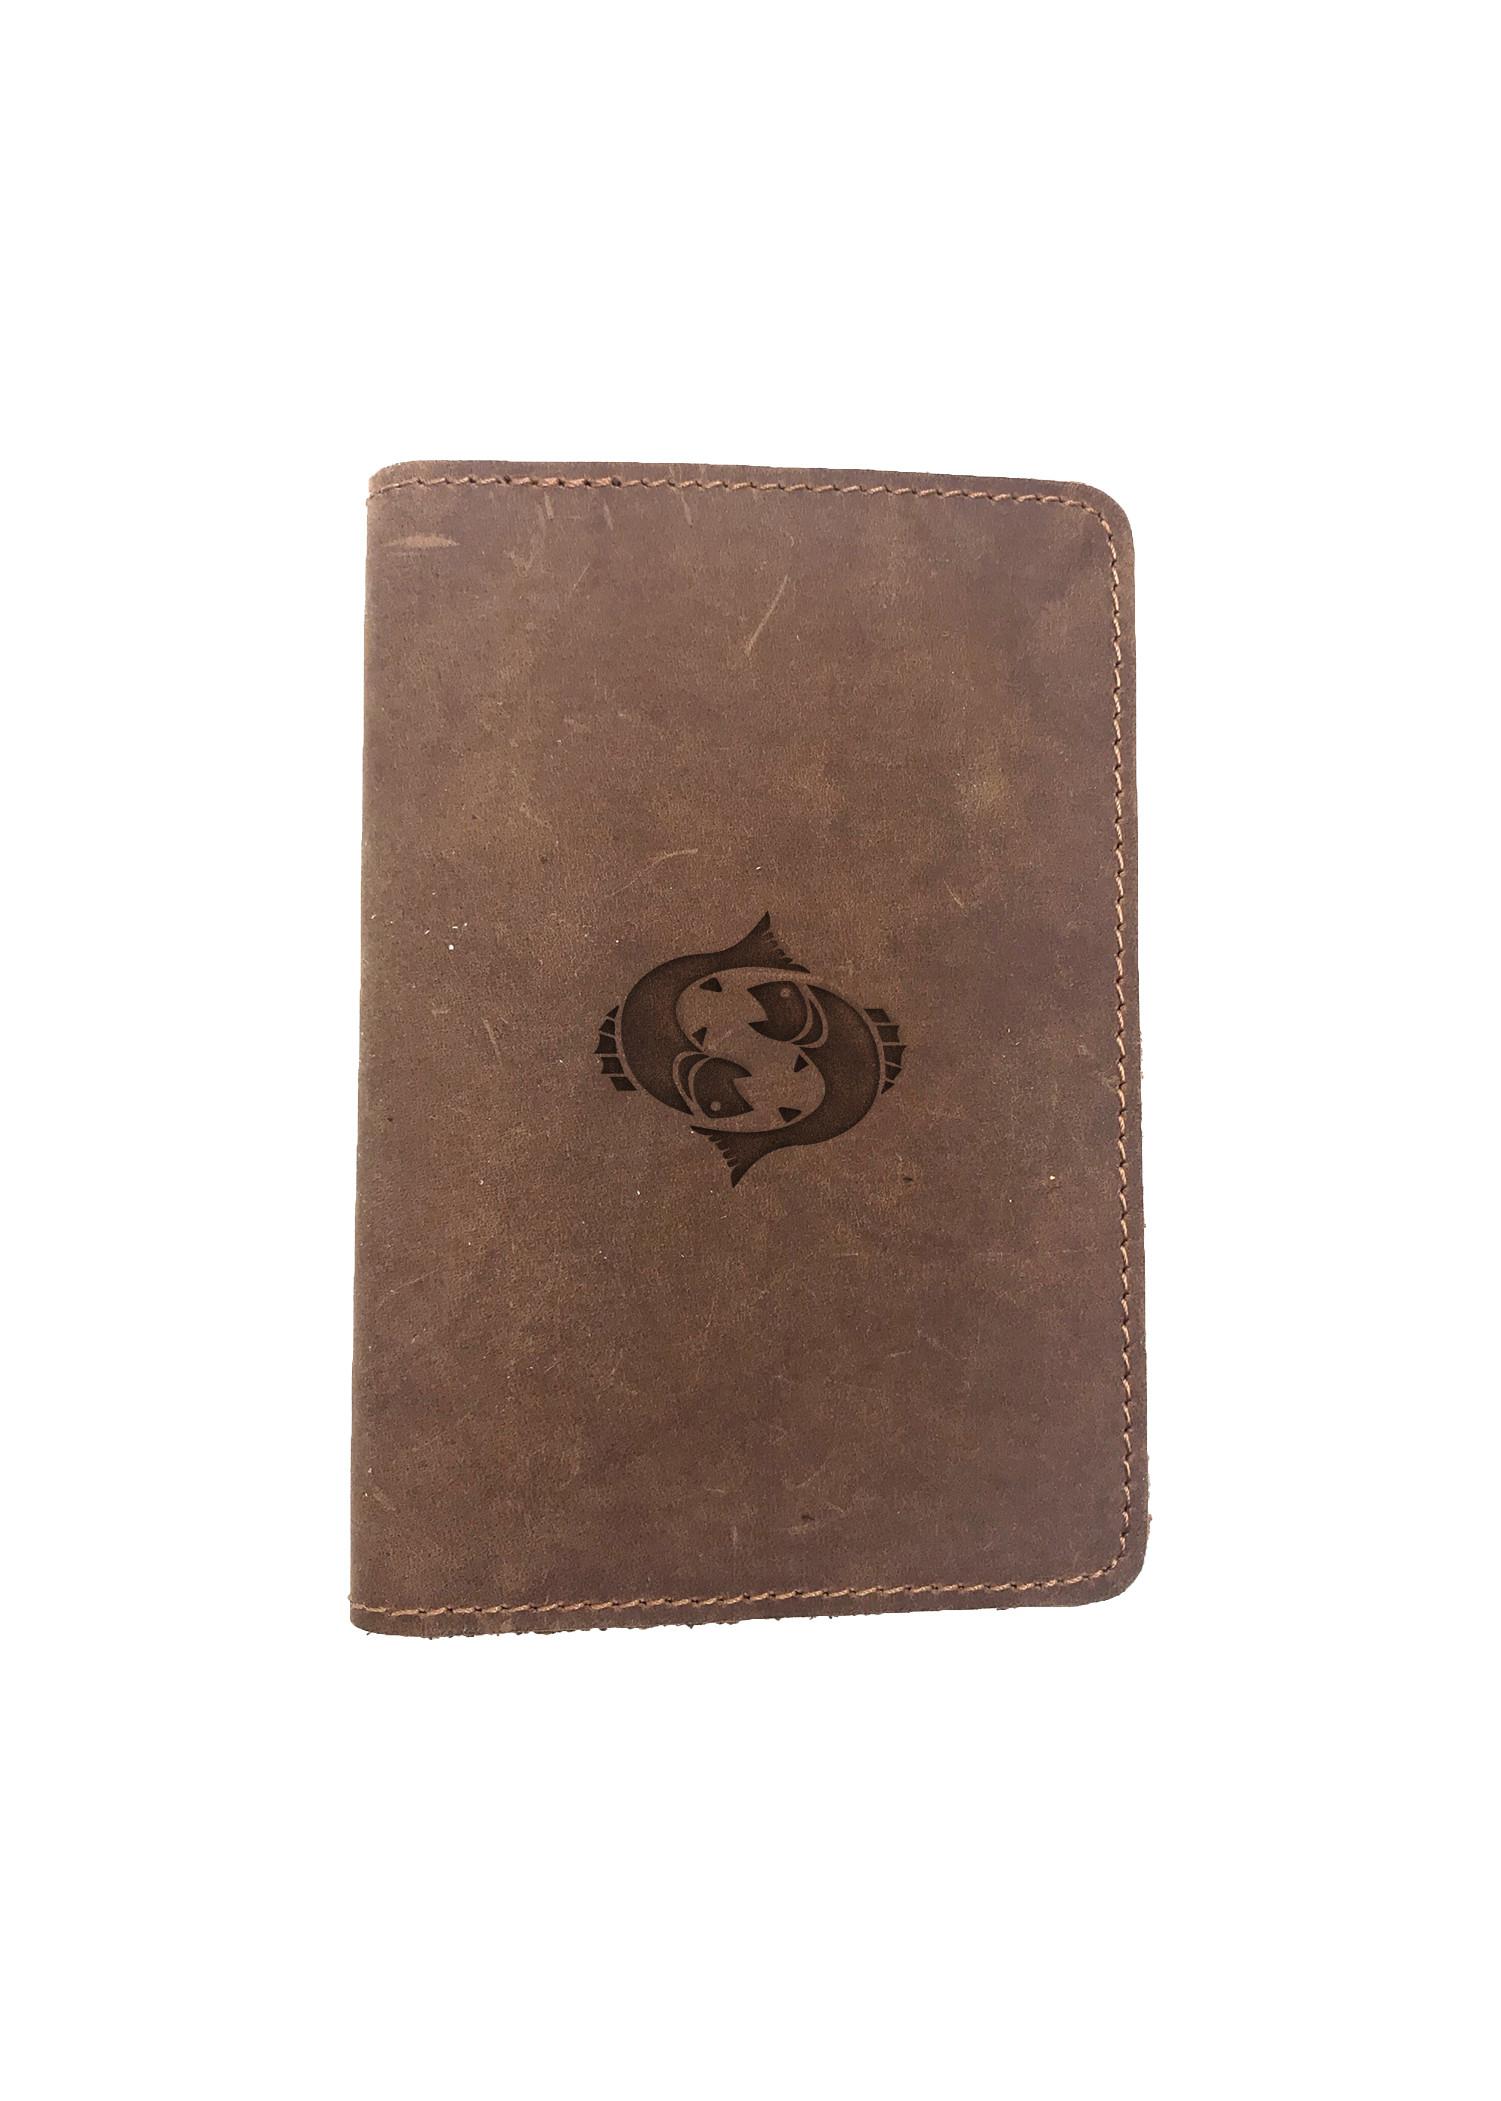 Passport Cover Bao Da Hộ Chiếu Da Sáp Khắc Hình Song ngư PISCES (BROWN)